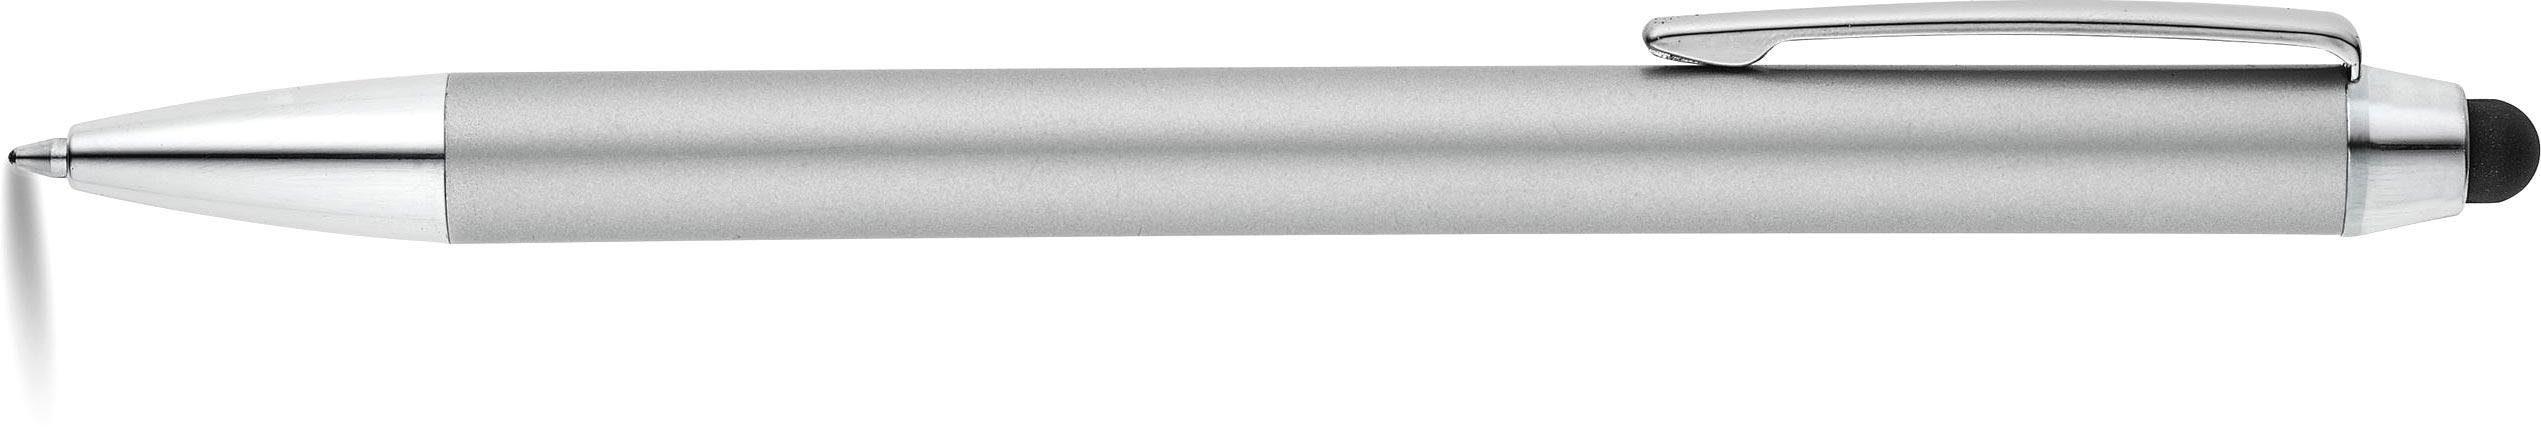 TEXAS Kuličkové pero matně stříbrné